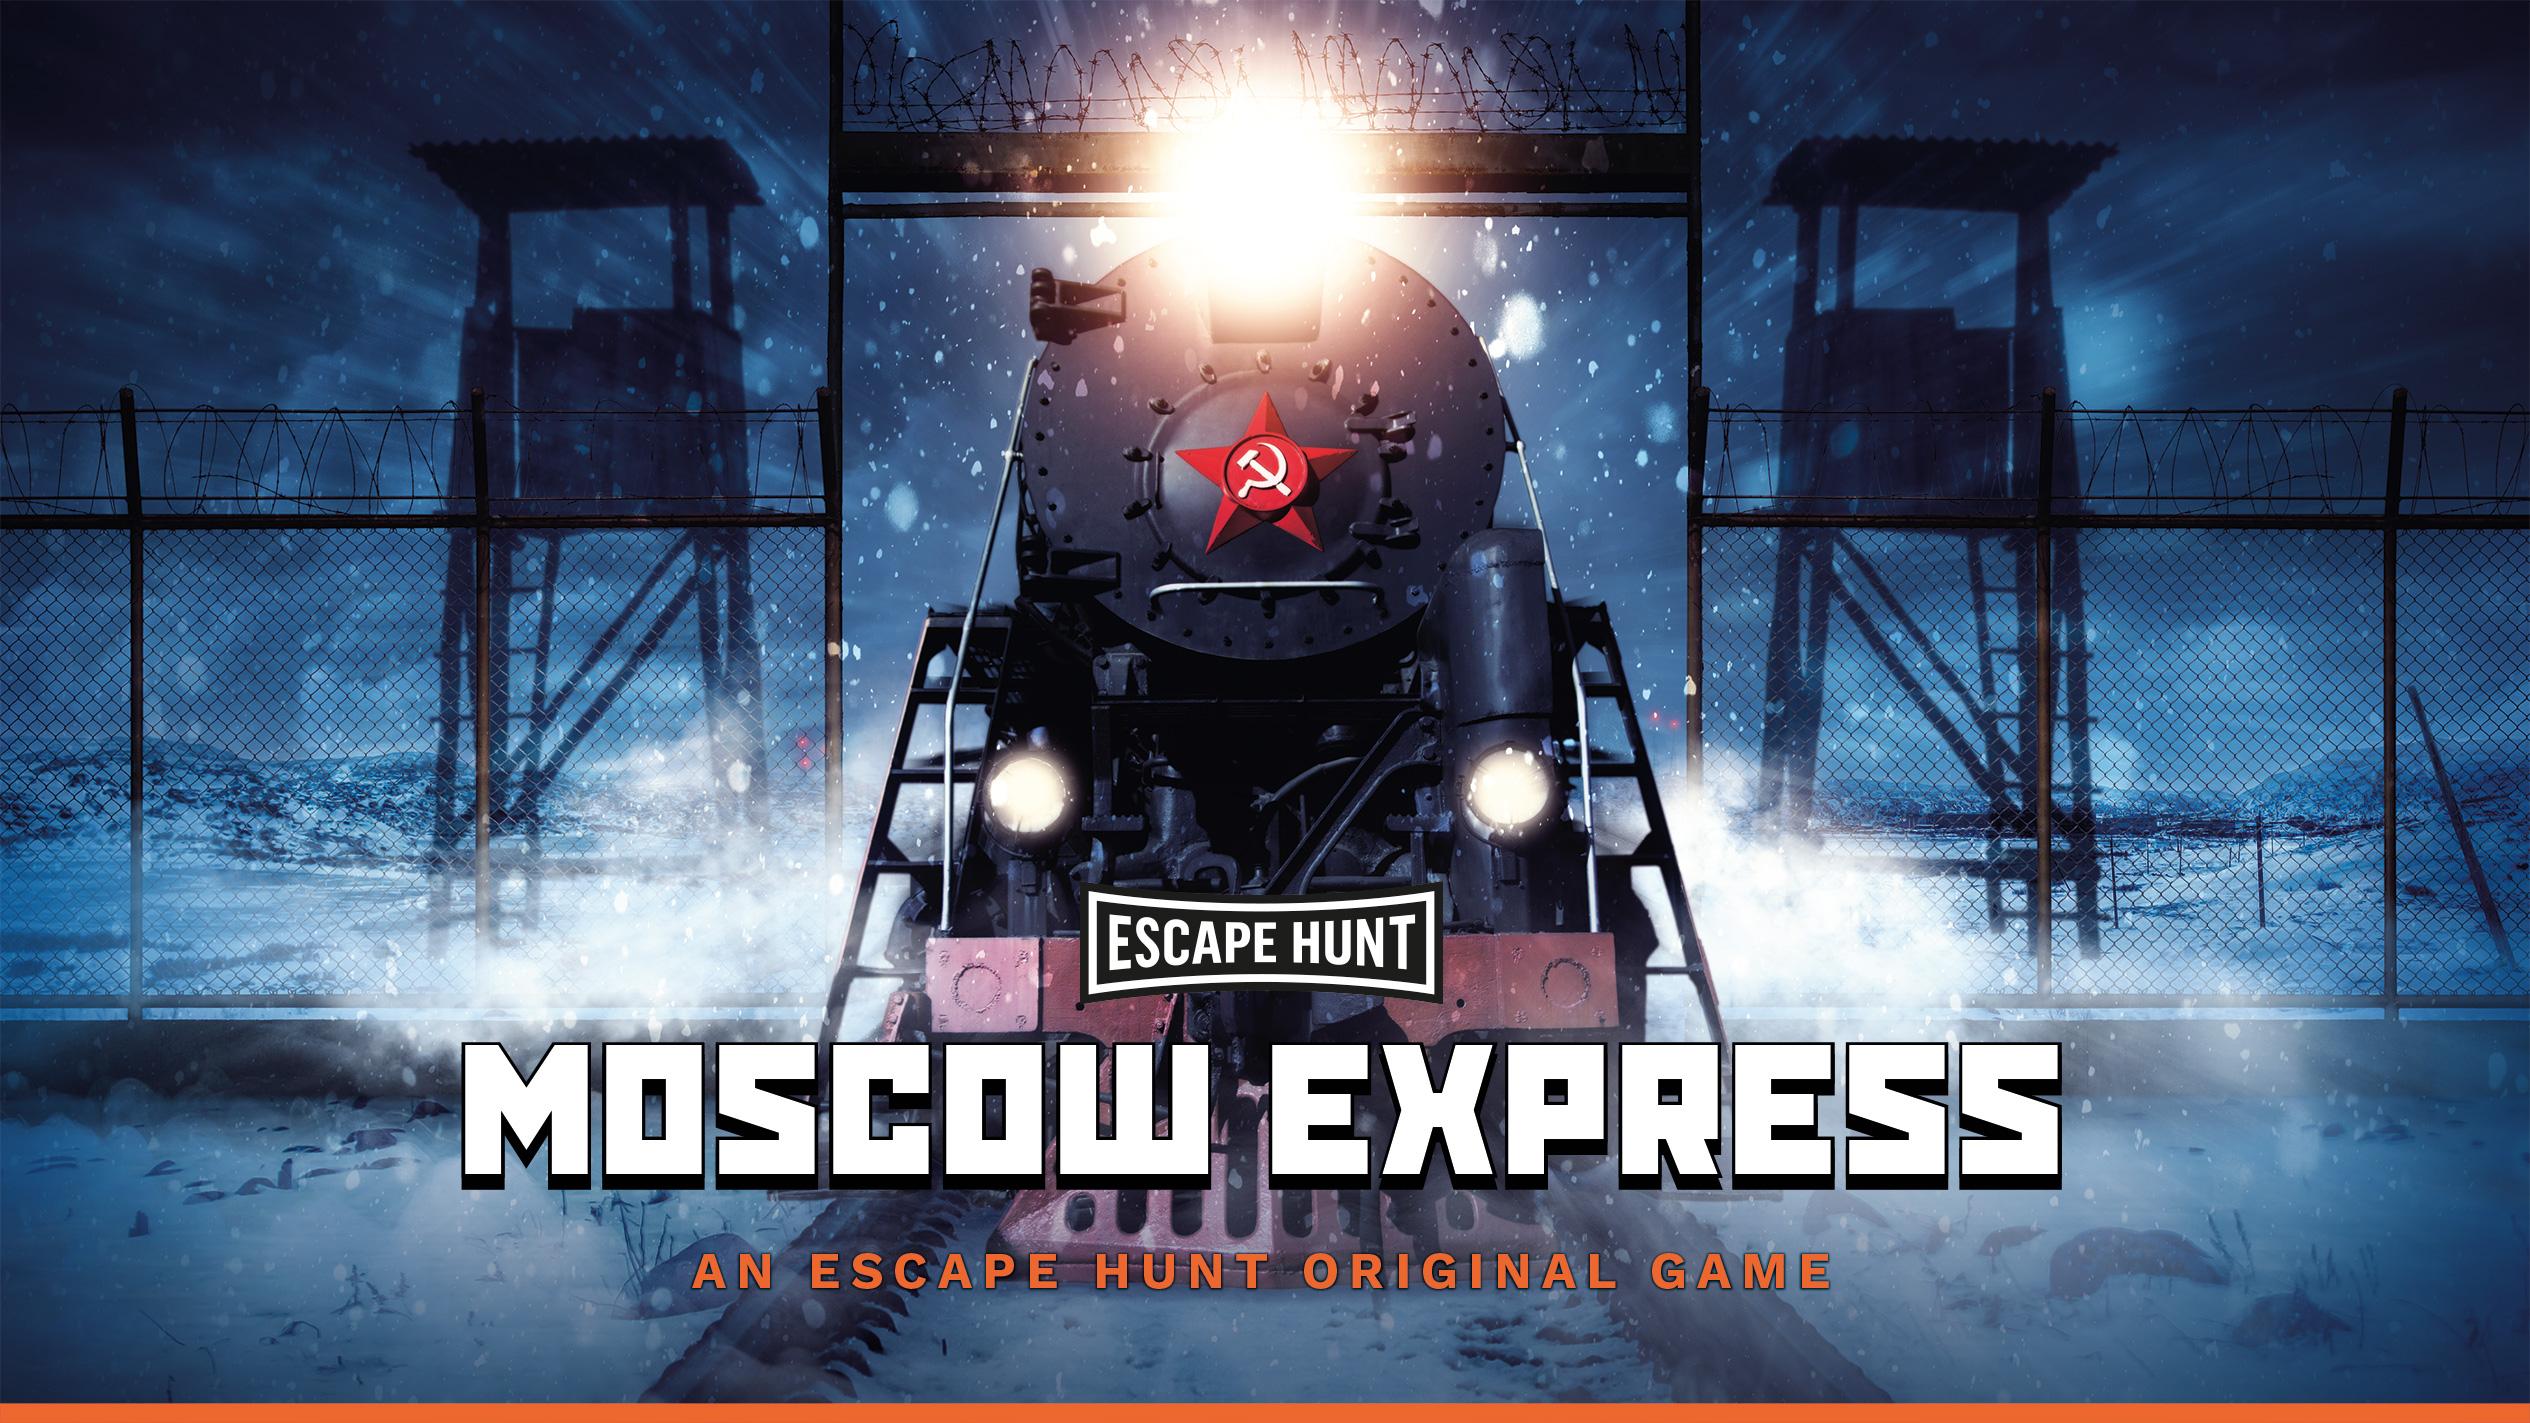 Escape Game Metz - Moscow Express